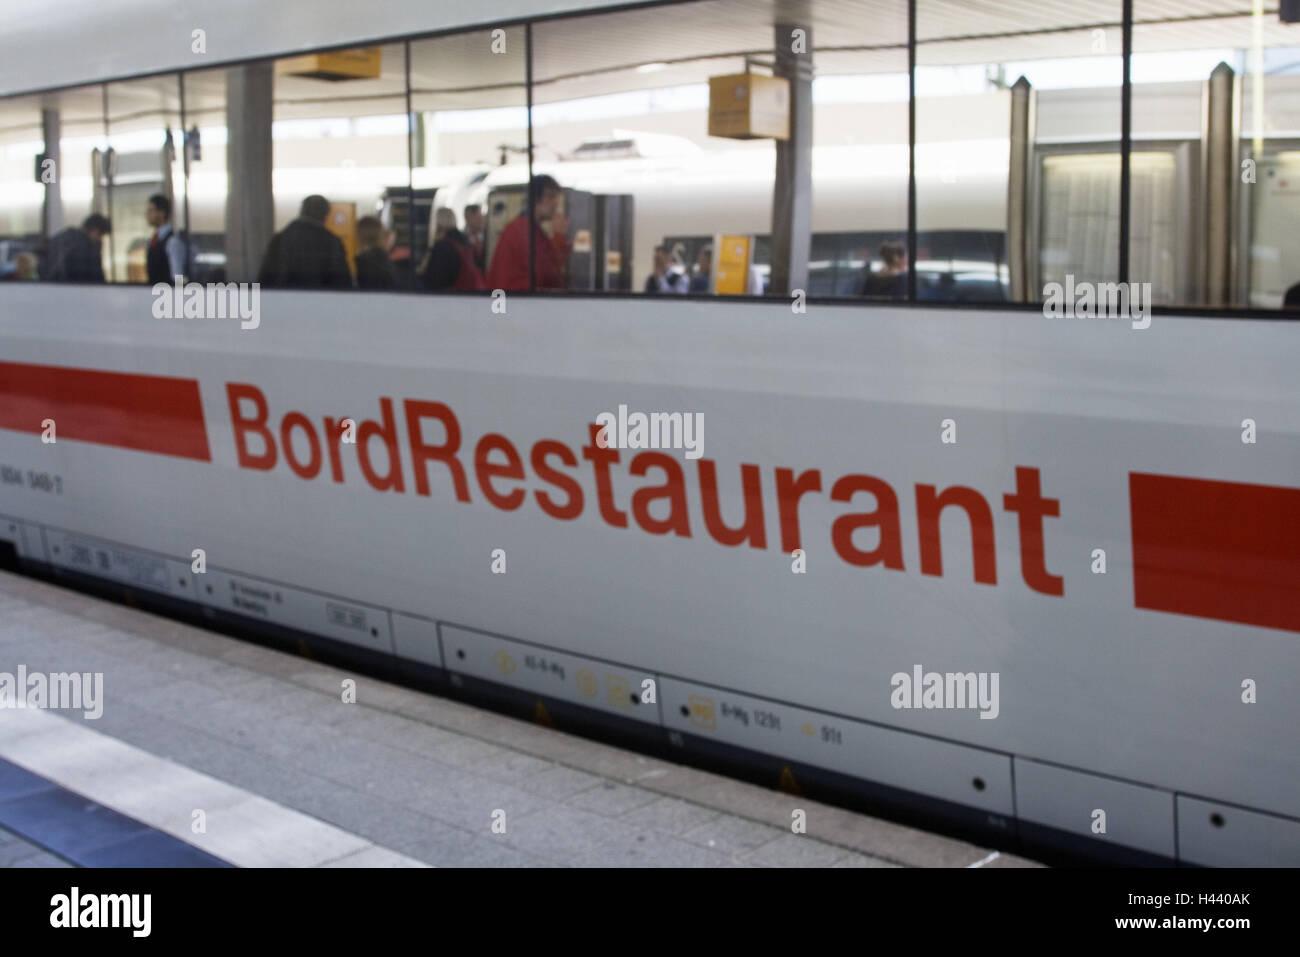 Railway track, intercity express, board restaurant, outside, no property release, platform, German Railways, train, - Stock Image